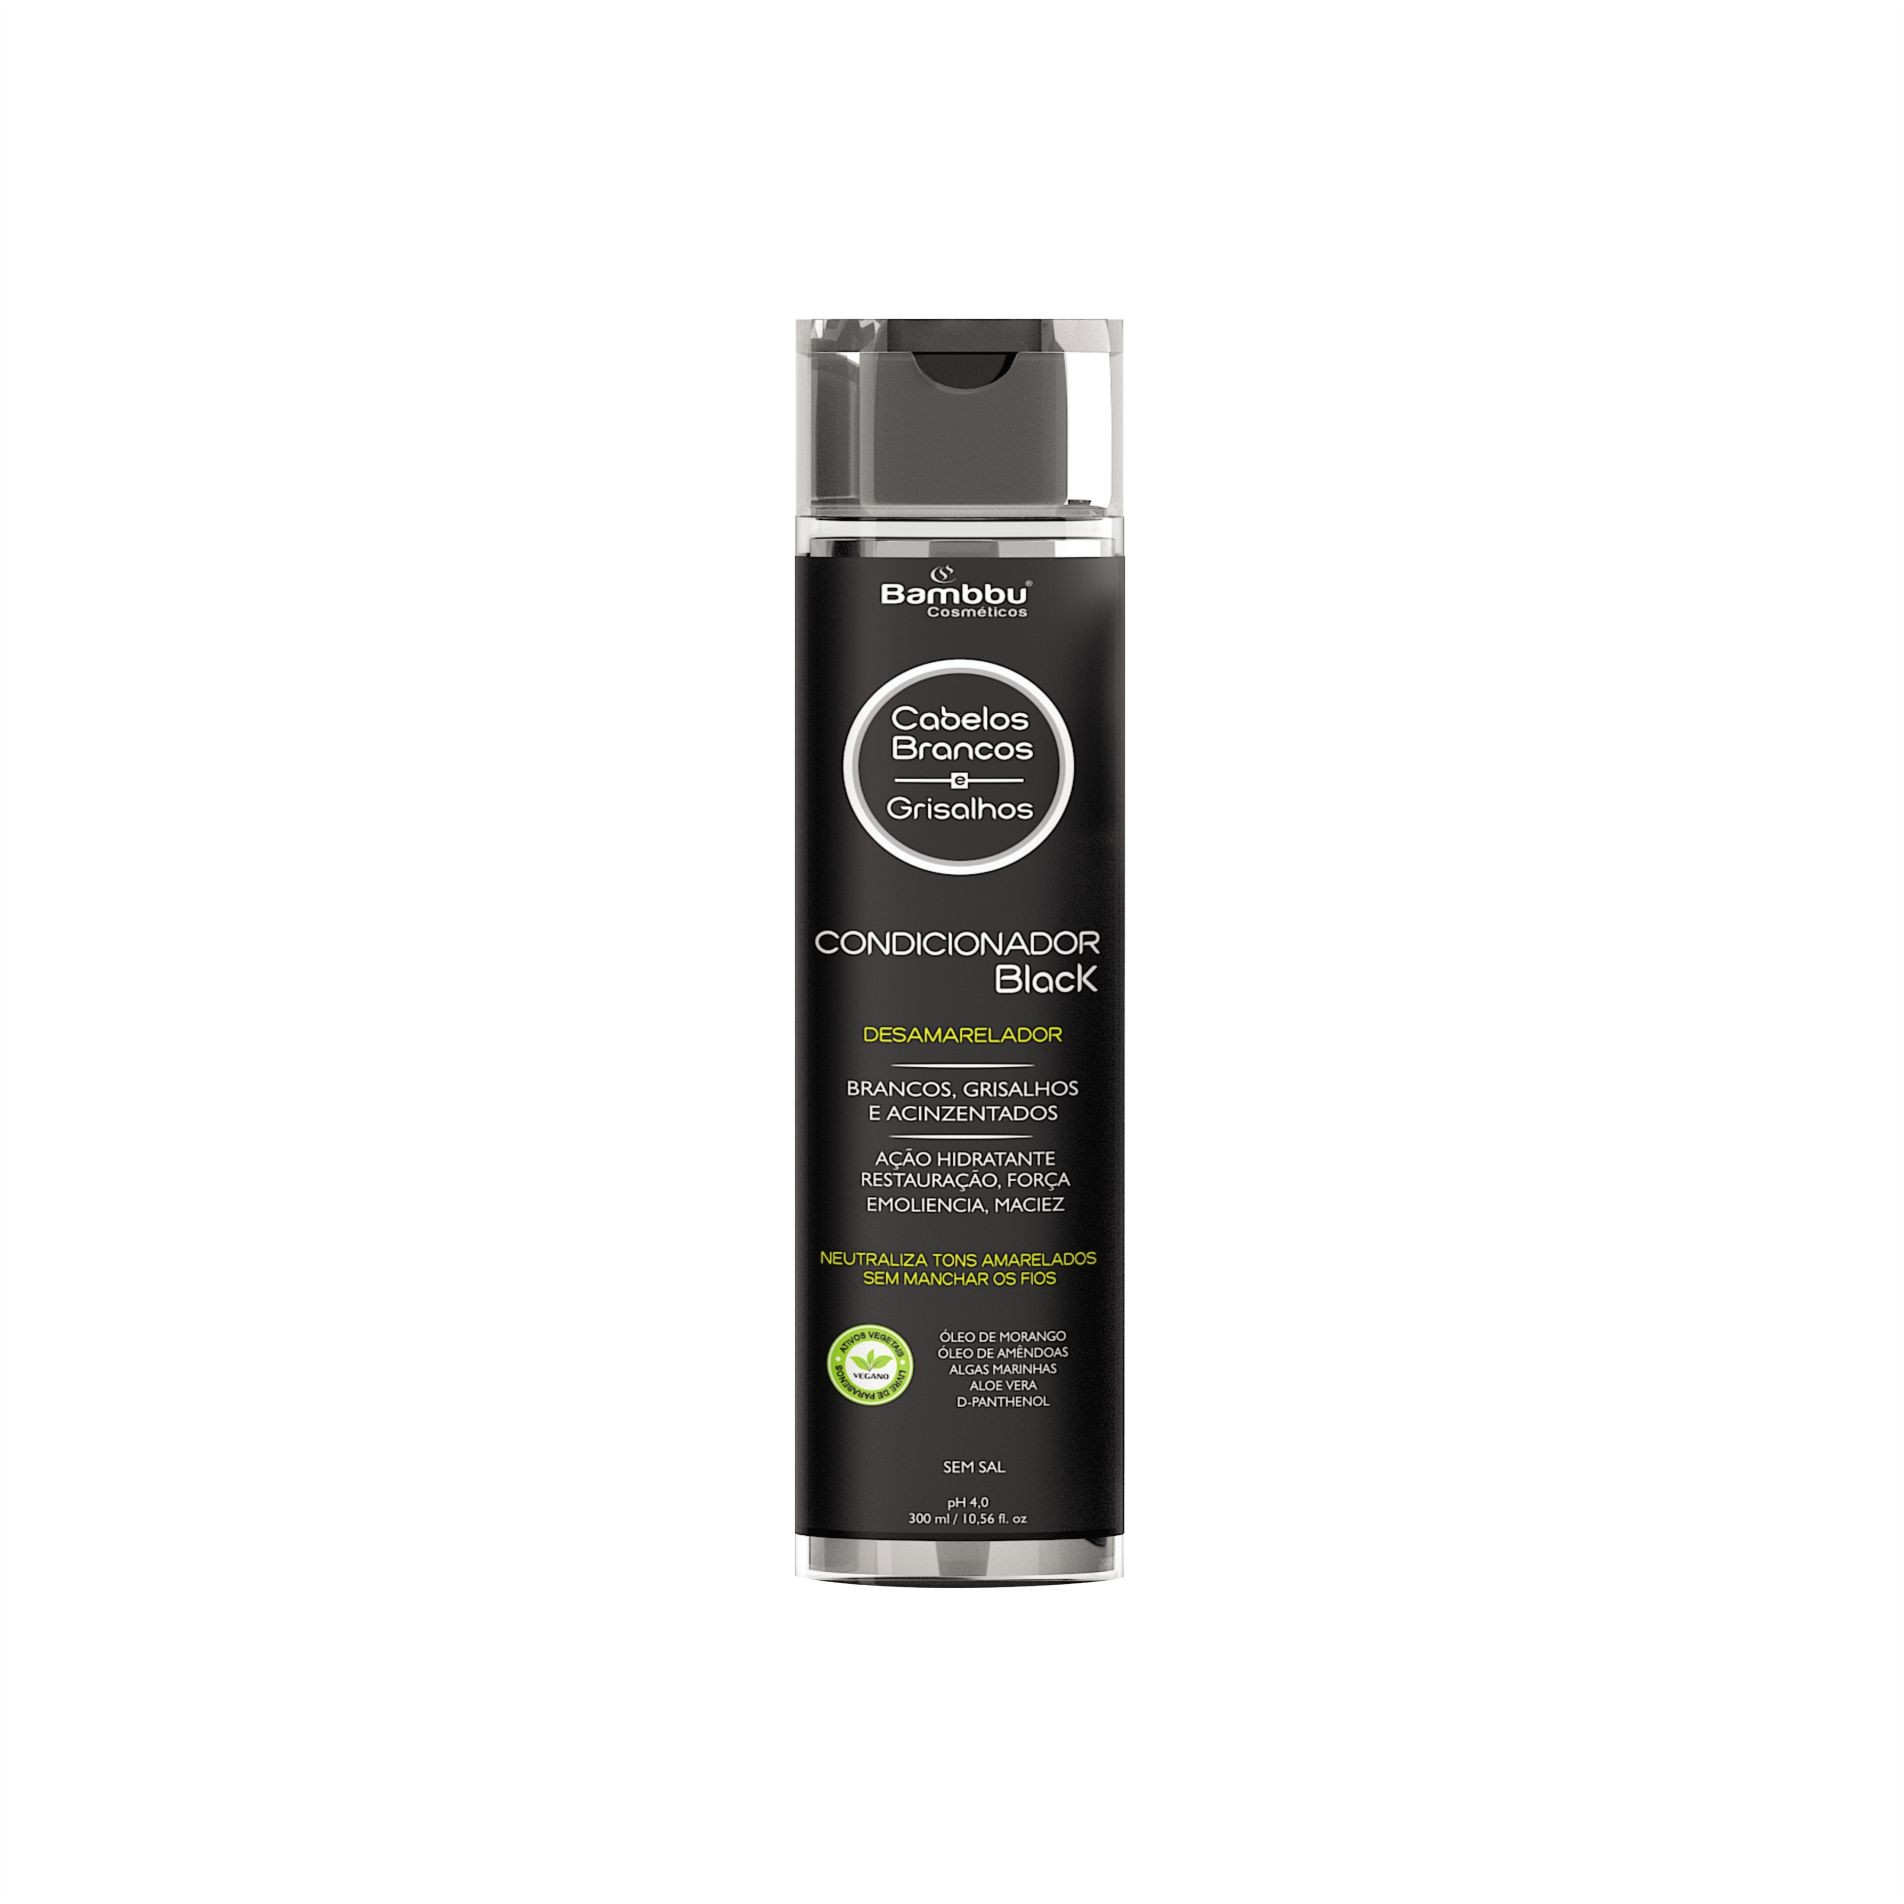 Condicionador Black Desamarelador - Cabelos Brancos e Grisalhos - 300ml